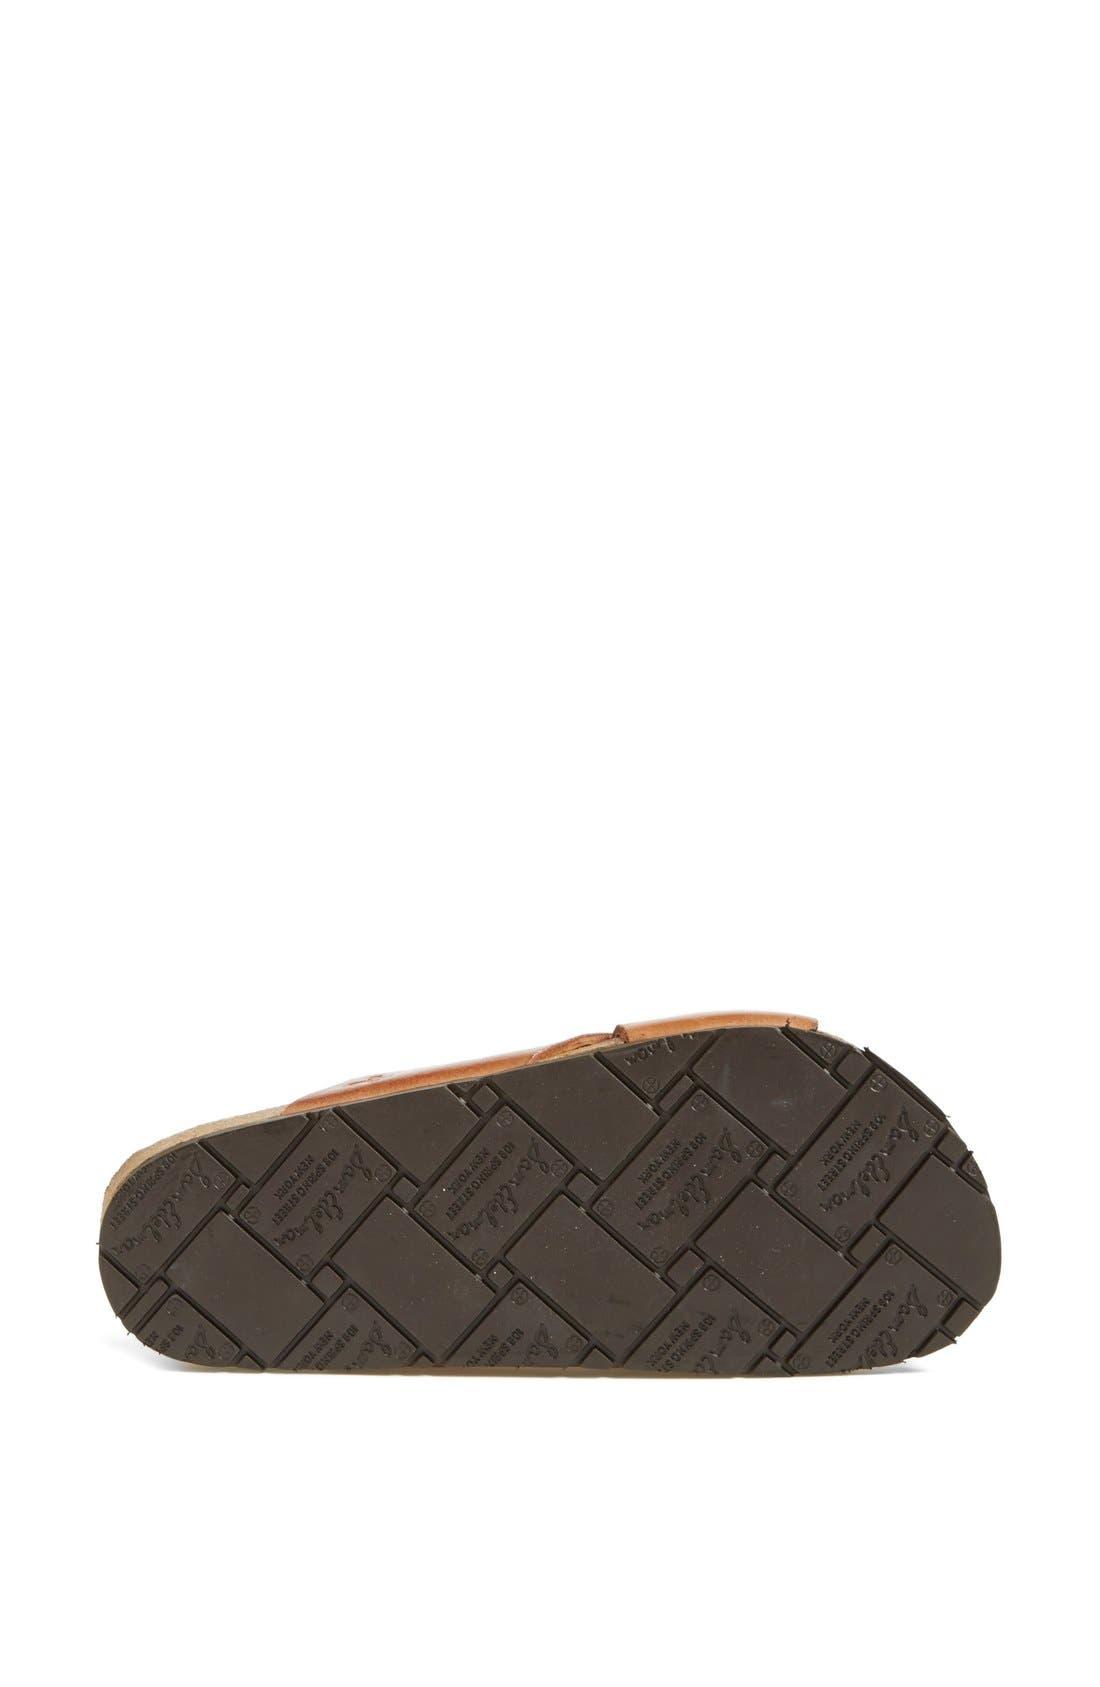 'Adora' Sandal,                             Alternate thumbnail 26, color,